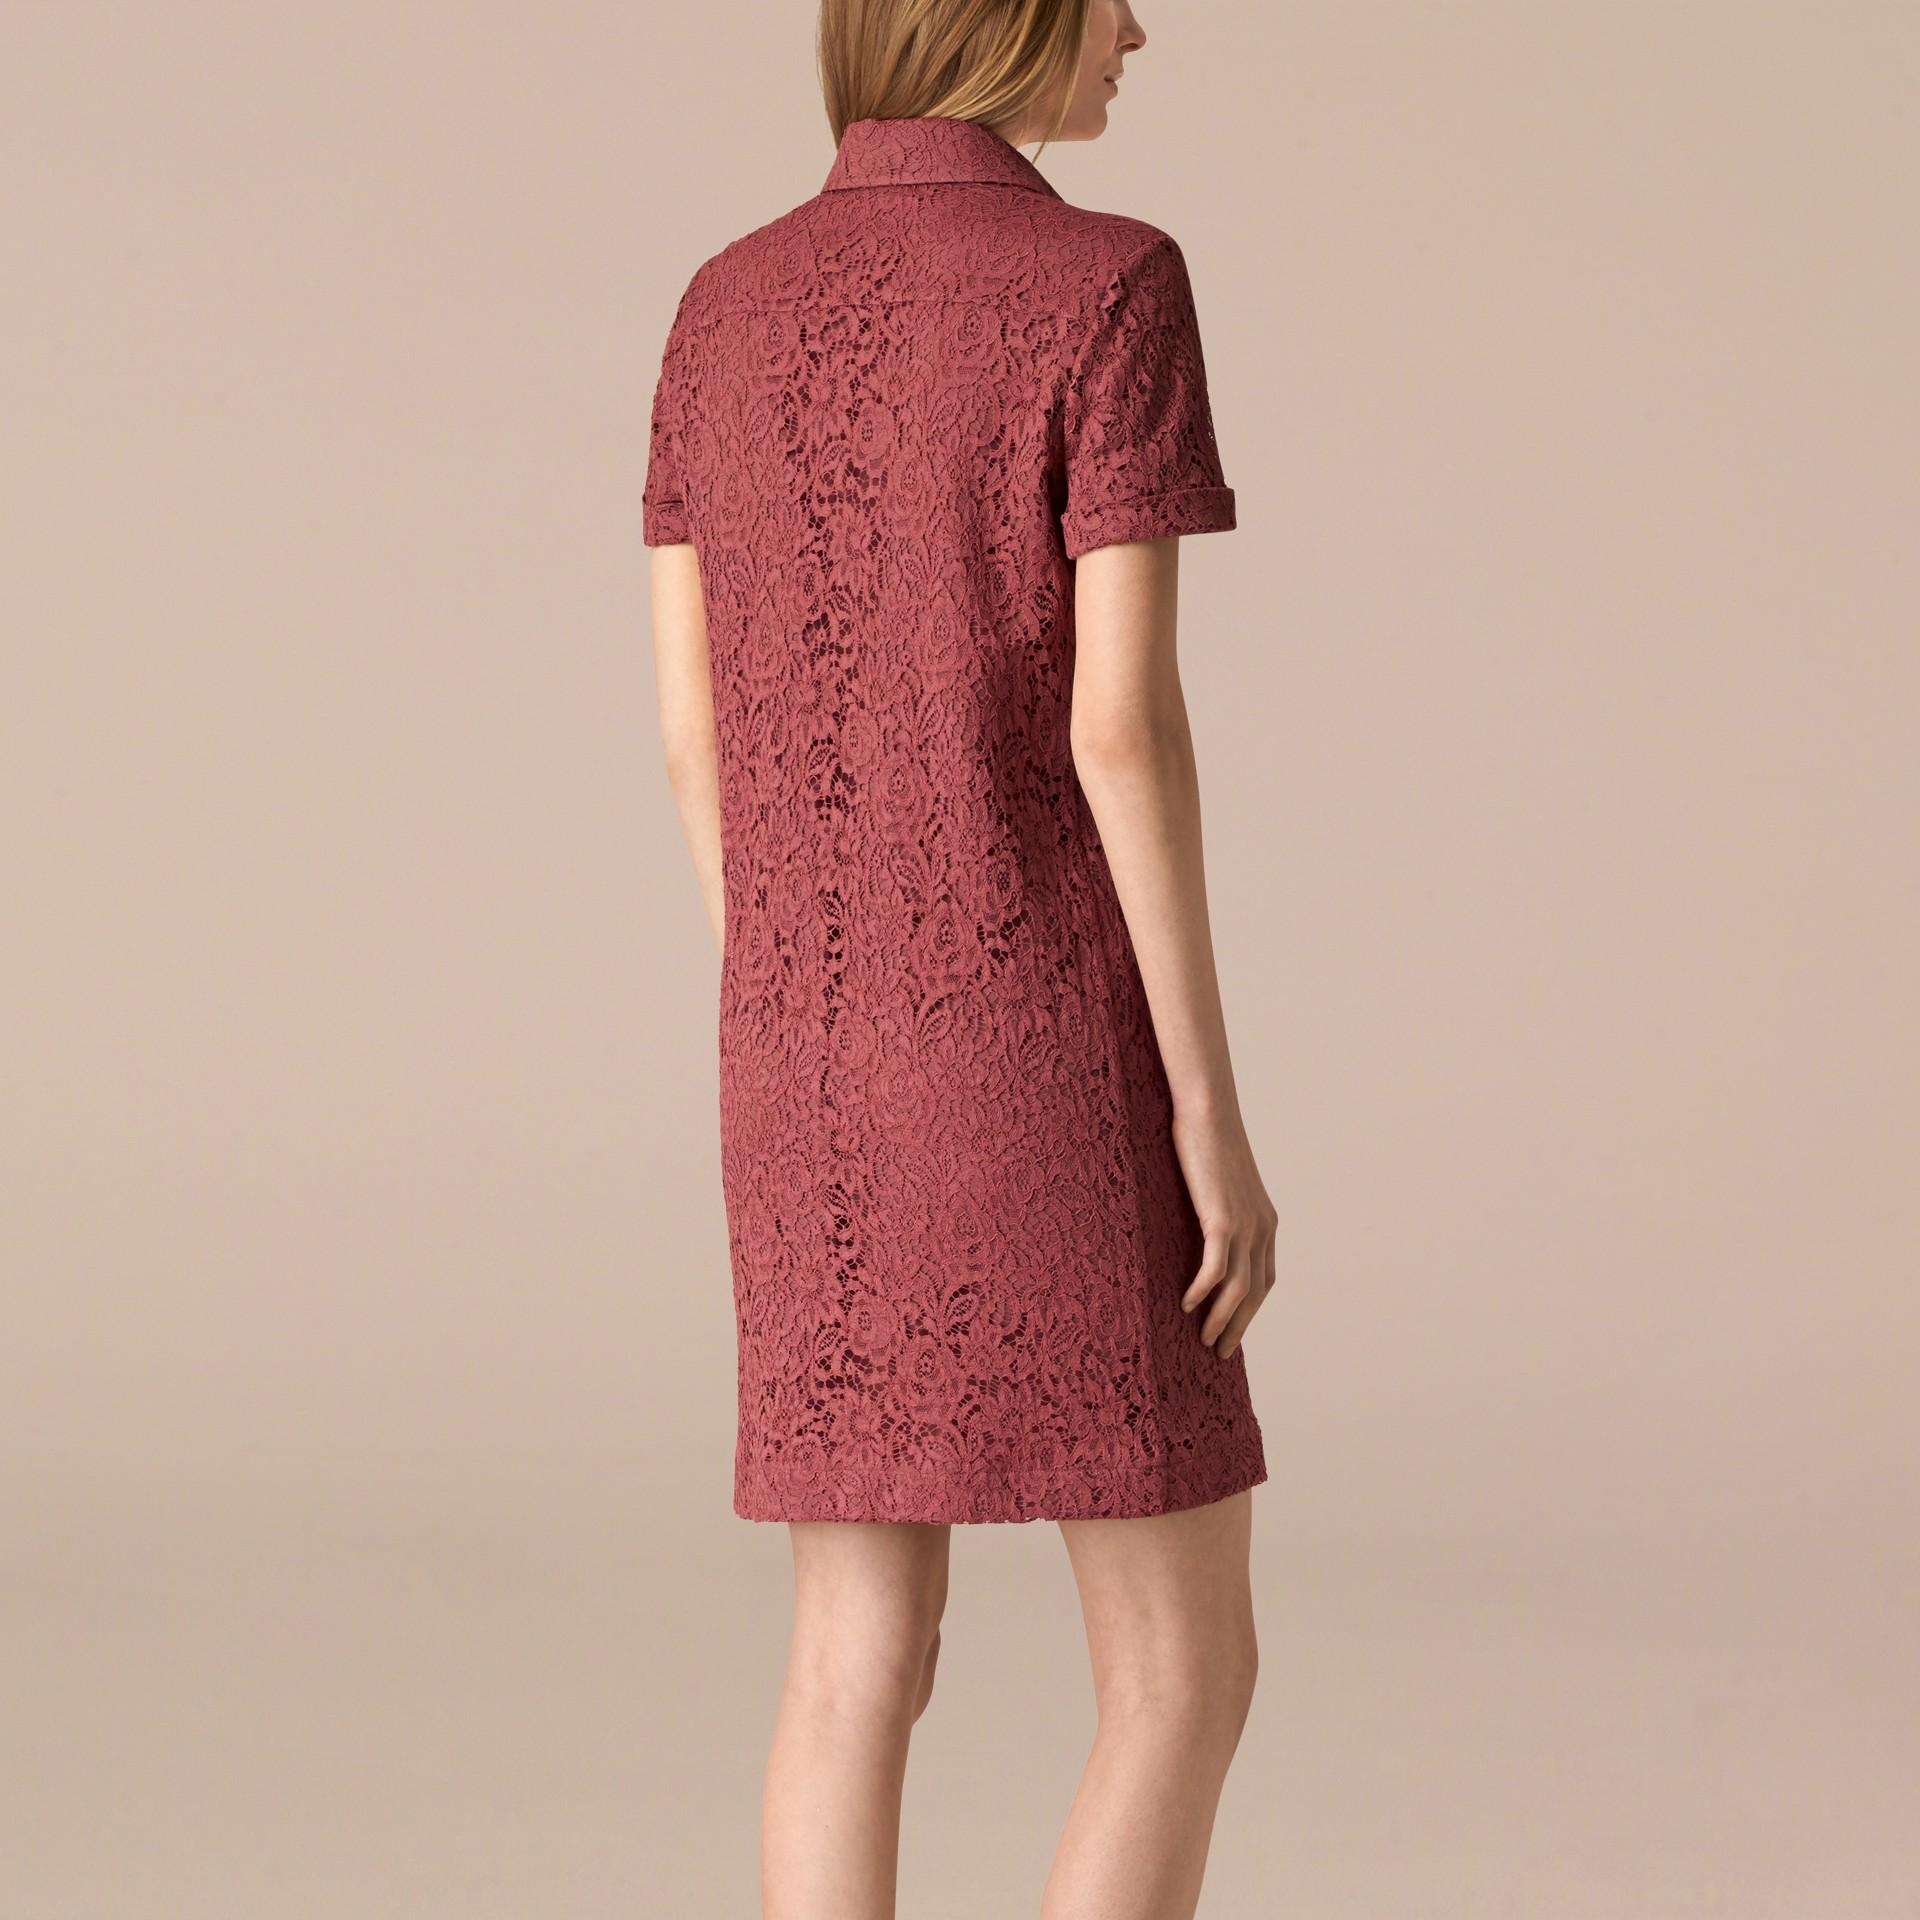 Mauve pink Vestido camisa de renda floral italiana - galeria de imagens 2